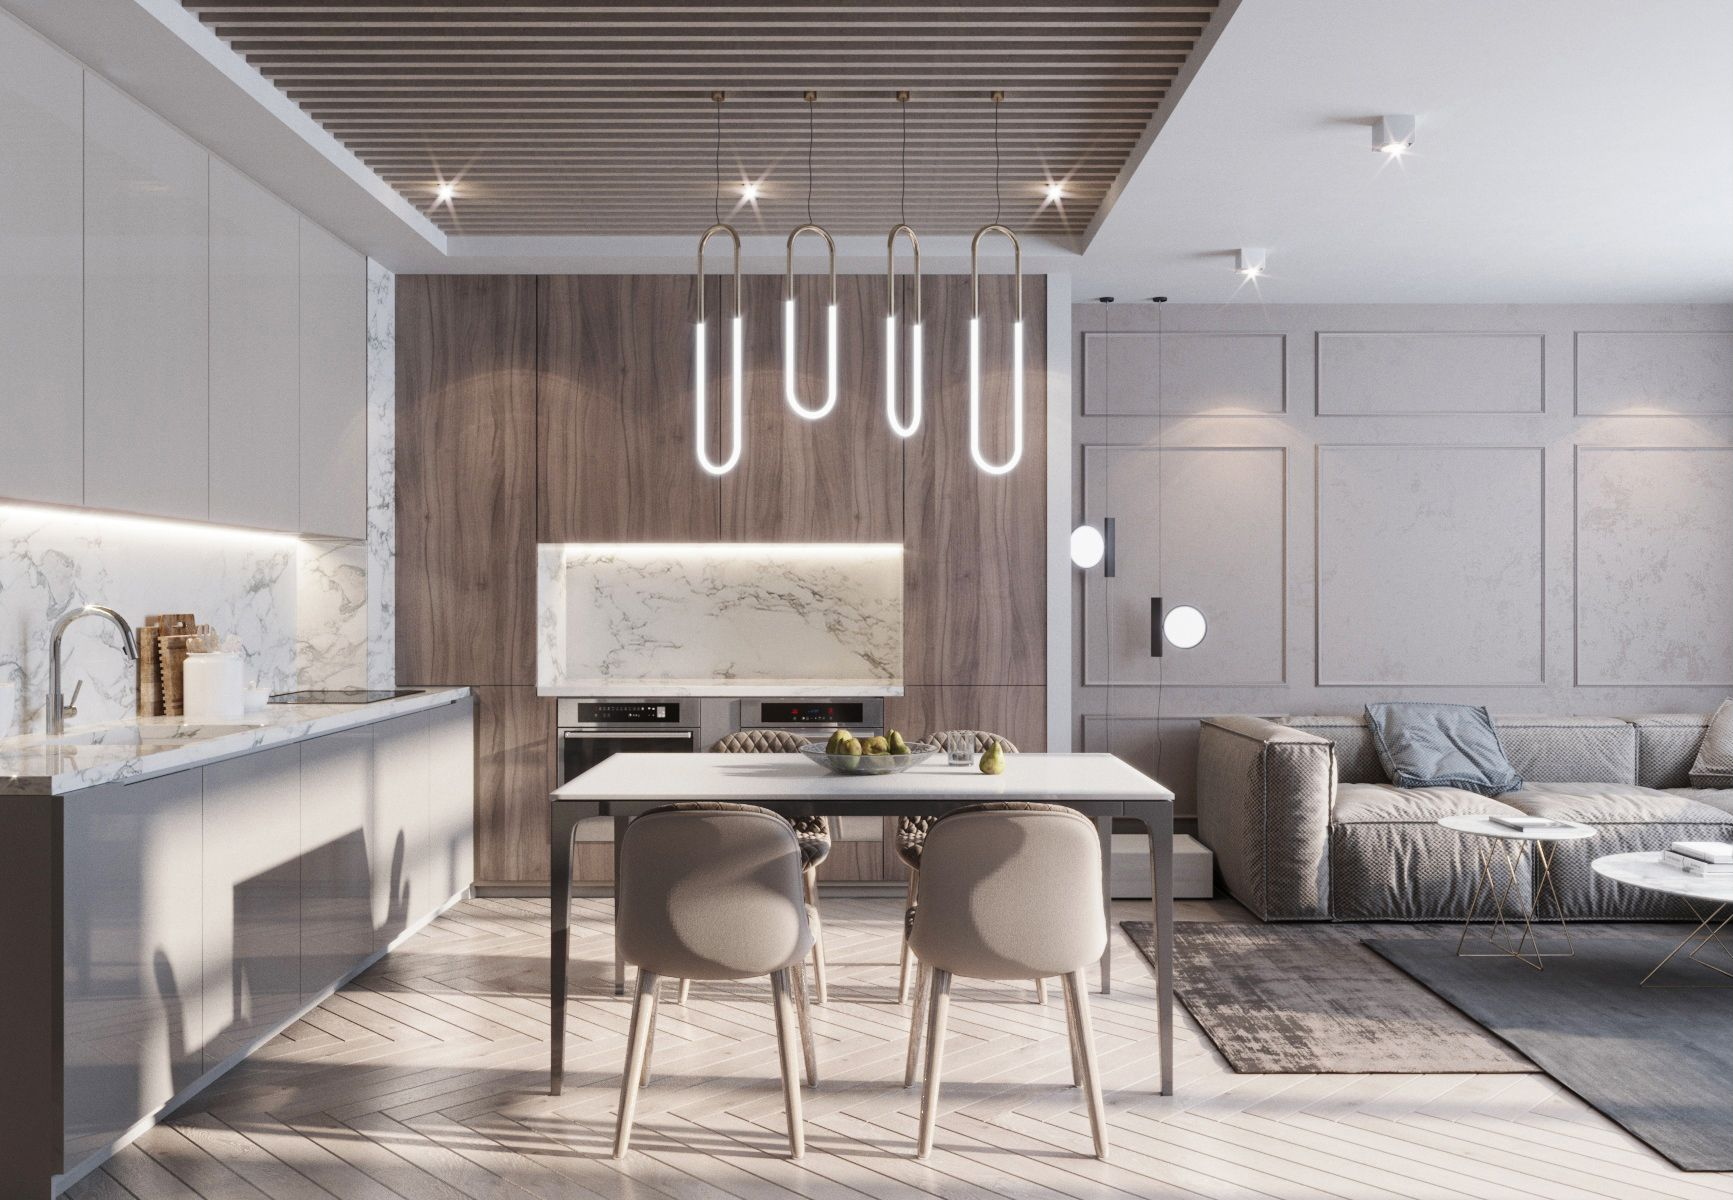 Living room and kitchen -  Interior design living room modern